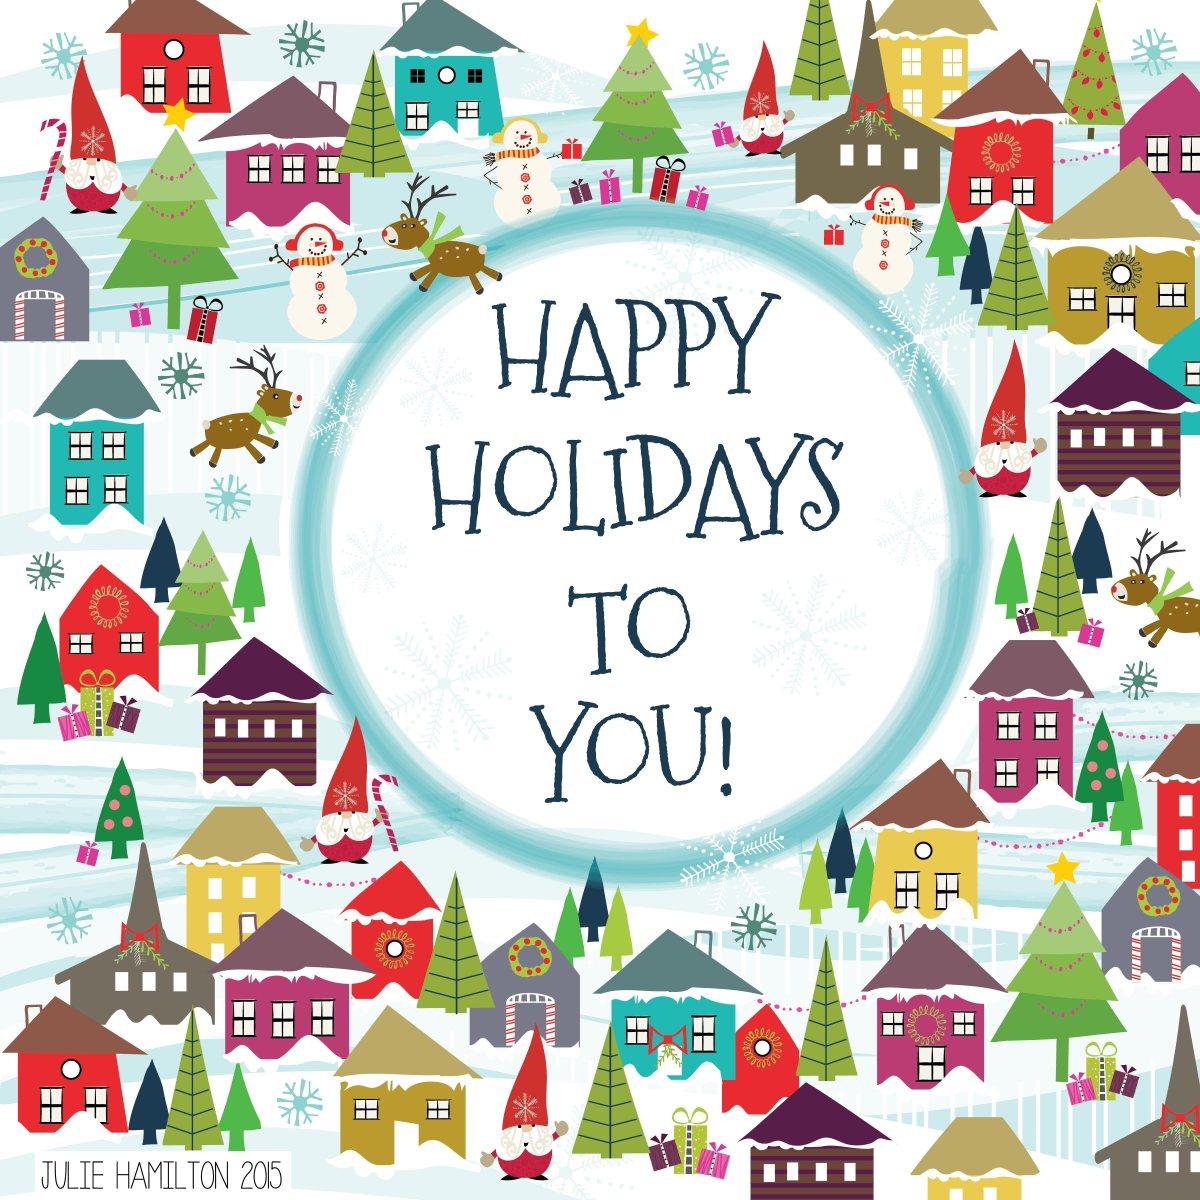 Holiday Houses - Julie Hamilton Creative {artistically afflicted blog}